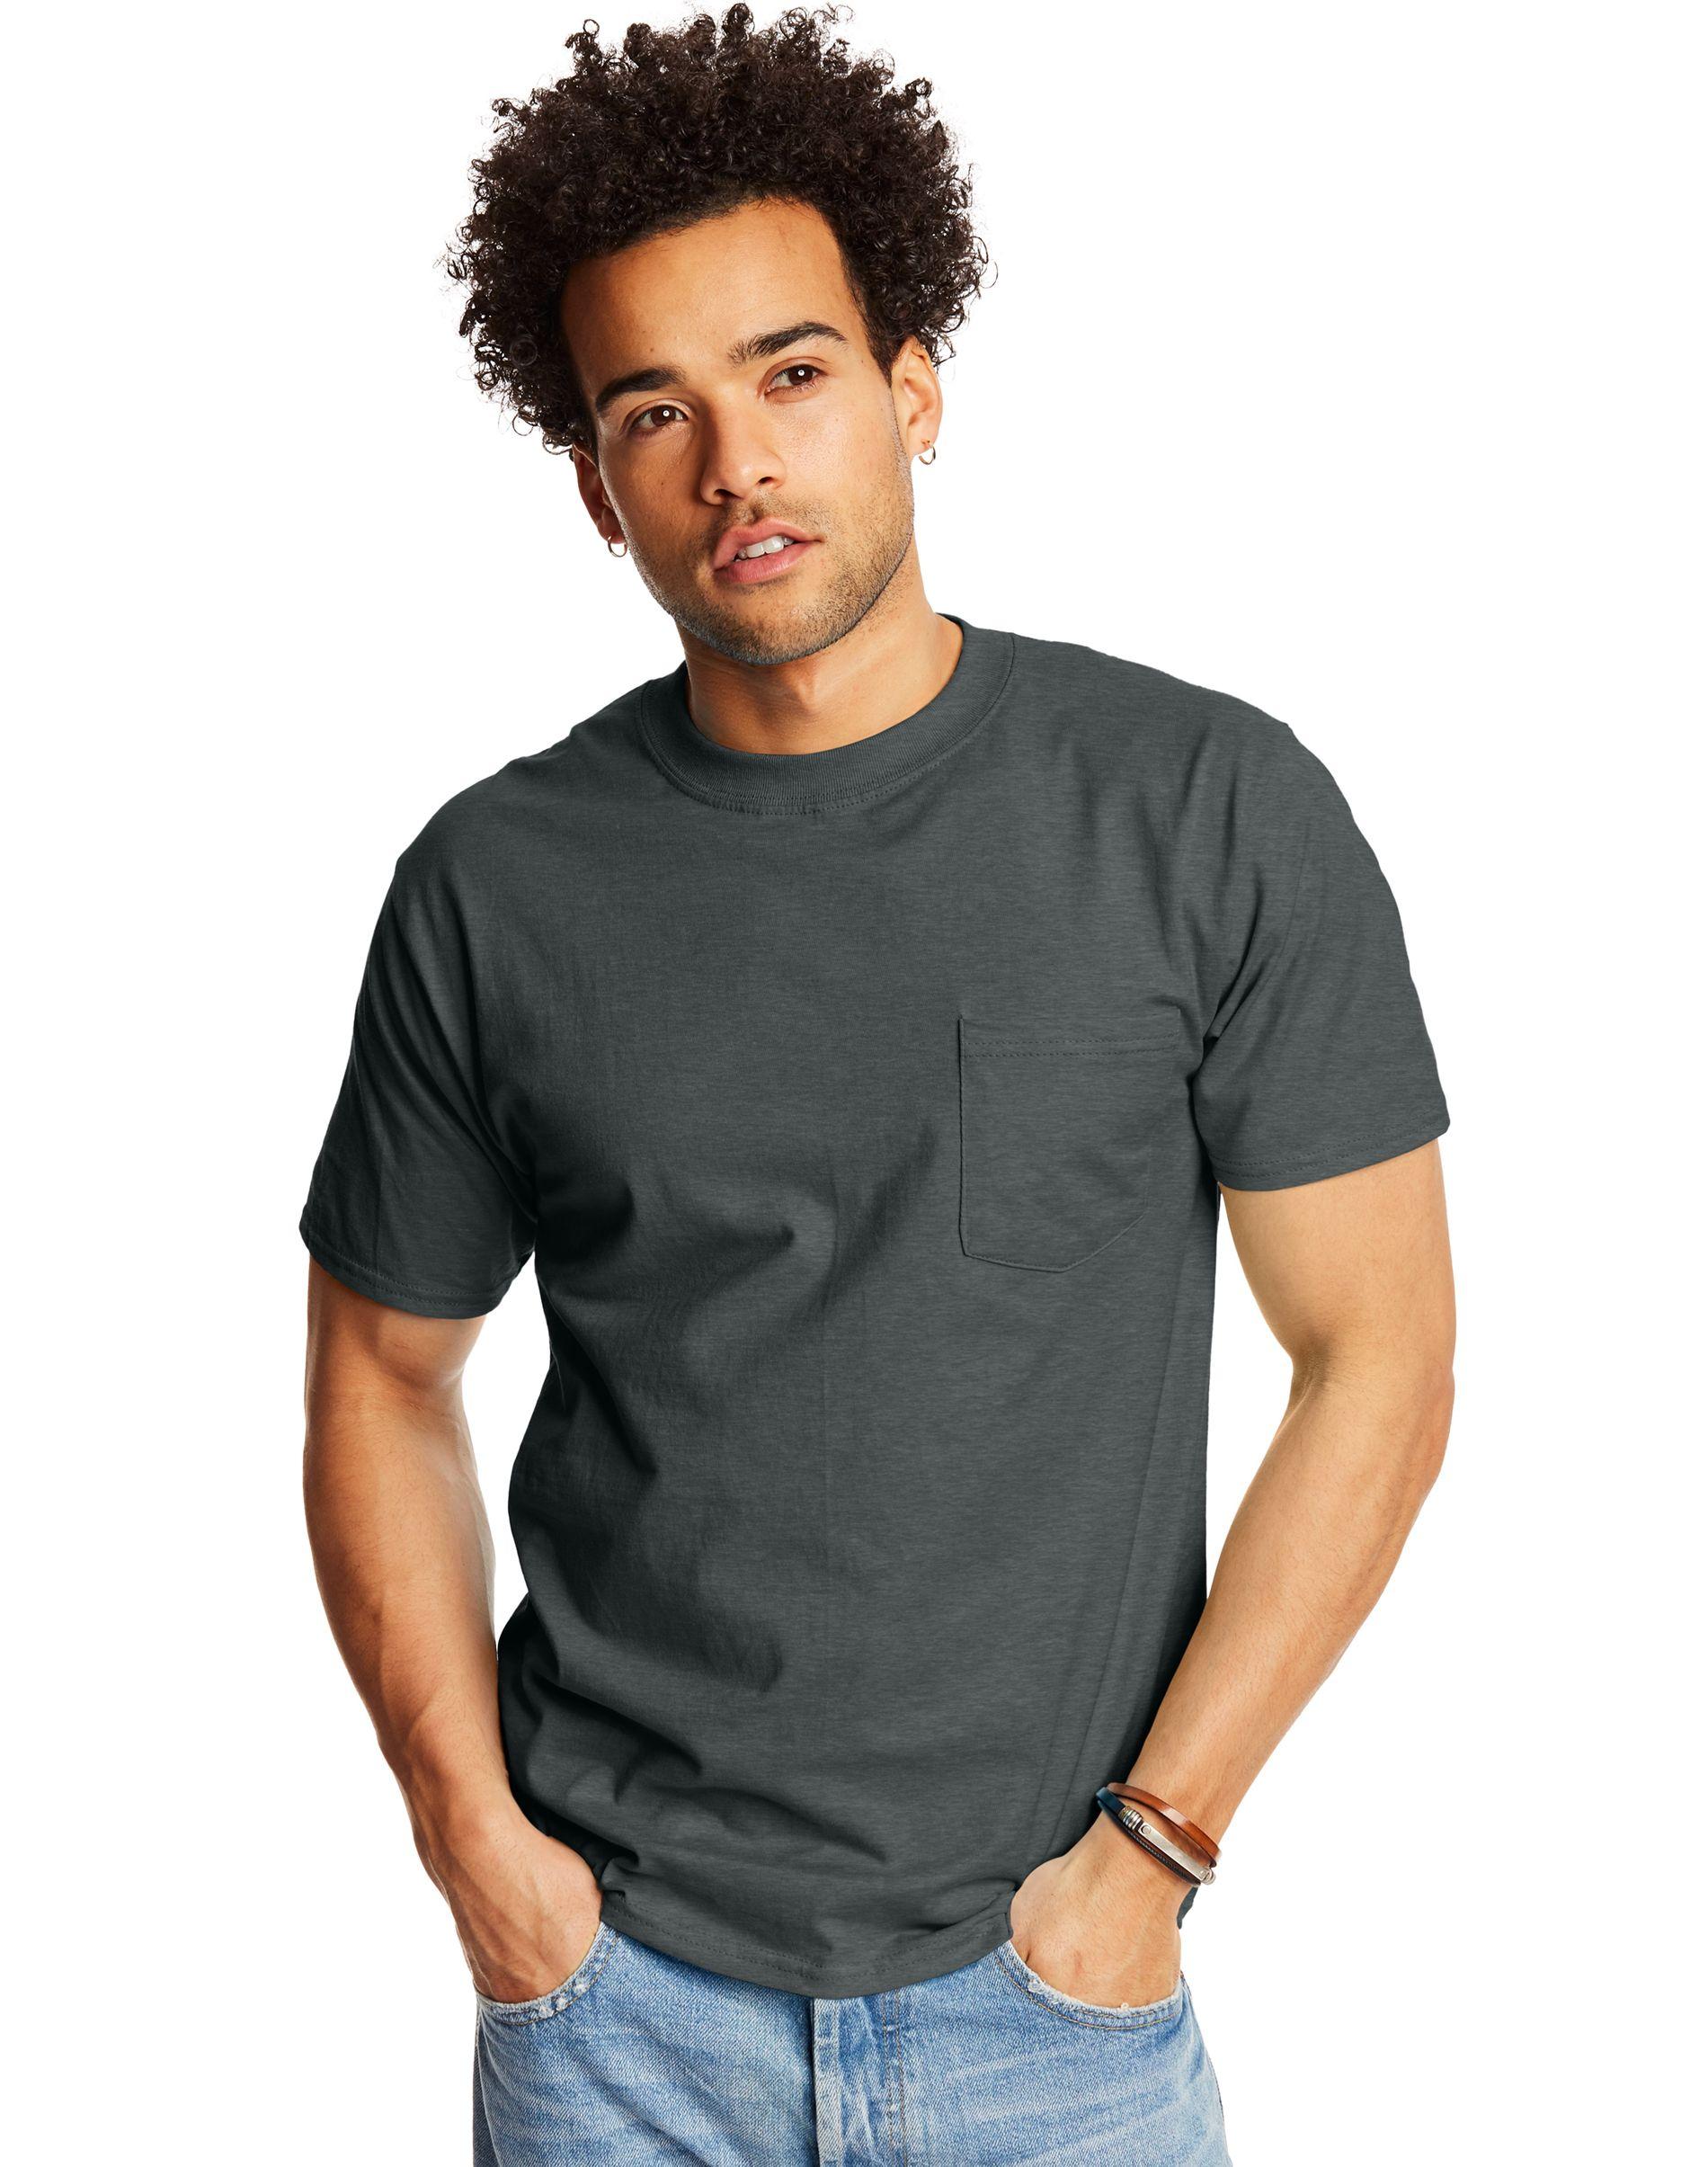 Hanes Beefy-T Adult Pocket T-Shirt men Hanes